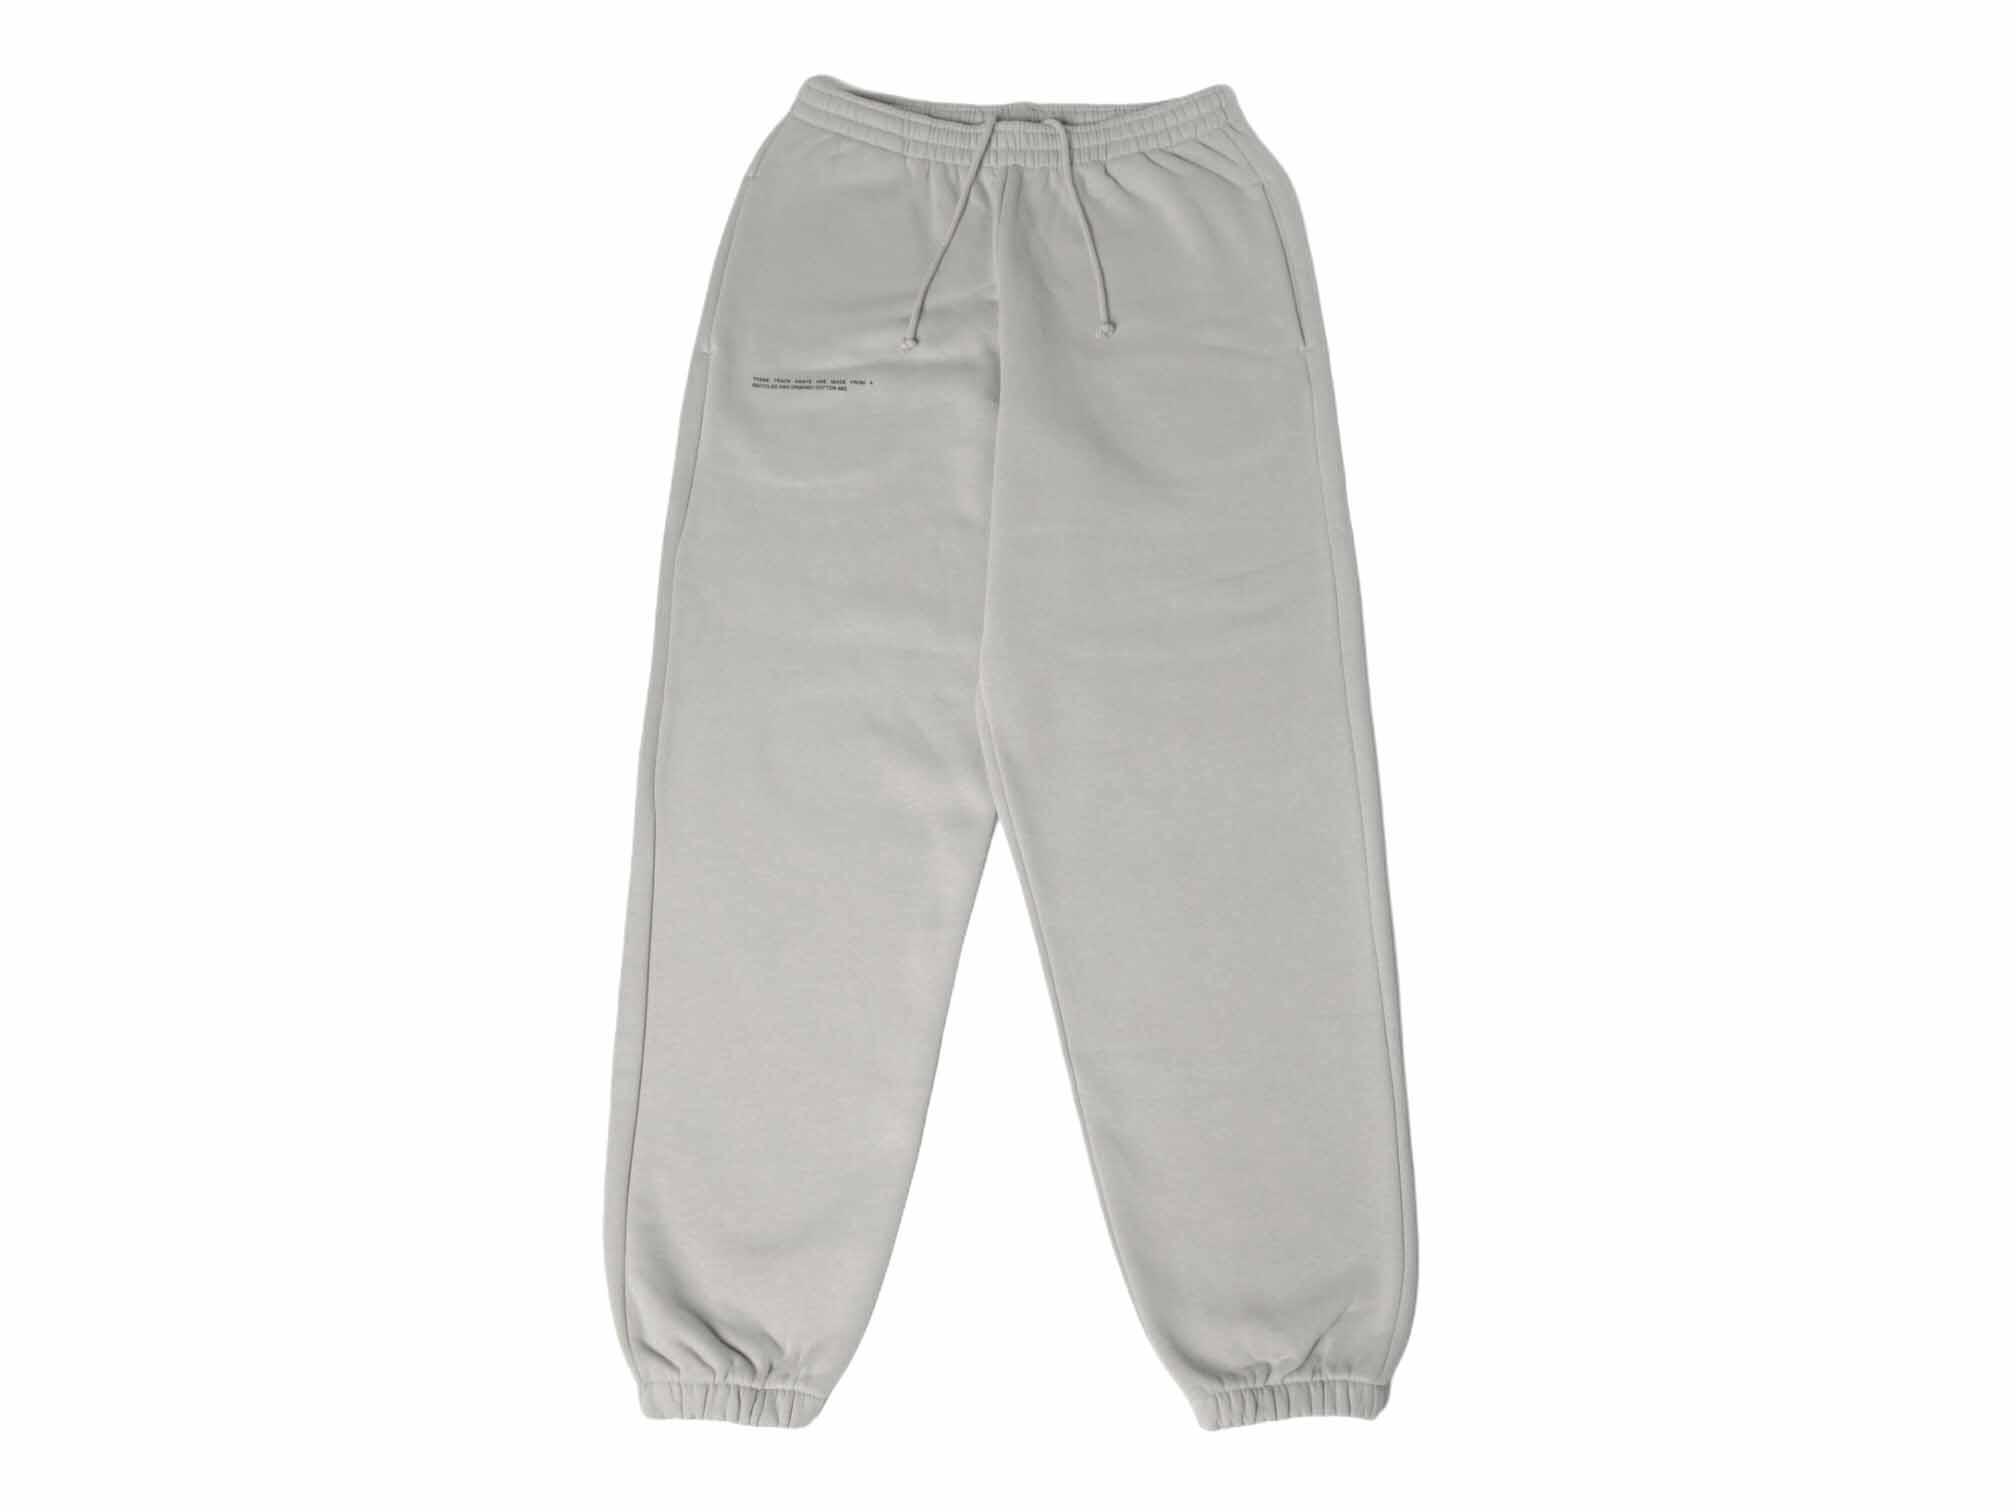 slide 1 - Heavyweight Cotton Track Pants - Stone